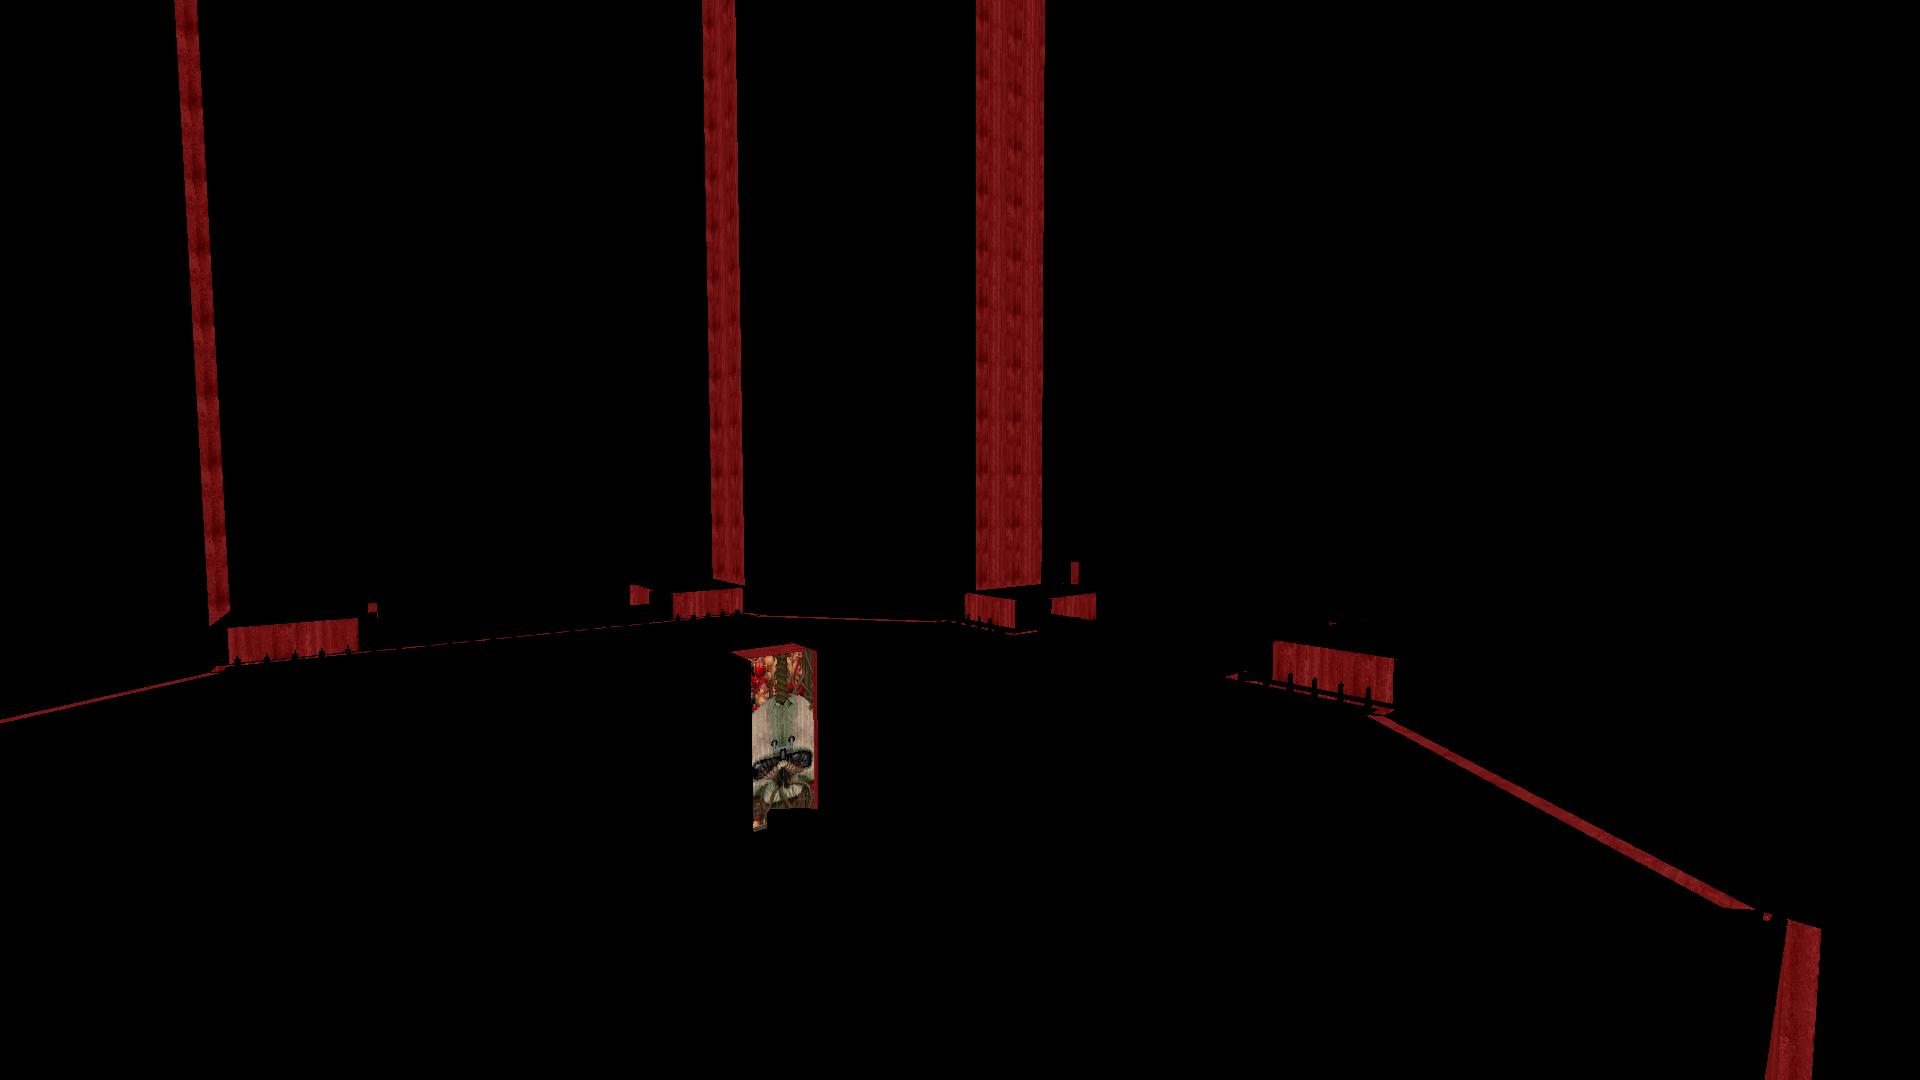 Screenshot_Doom_20210101_105518.png.bdb3b7b2bb0427727e8bd9f1cf7be2e5.png